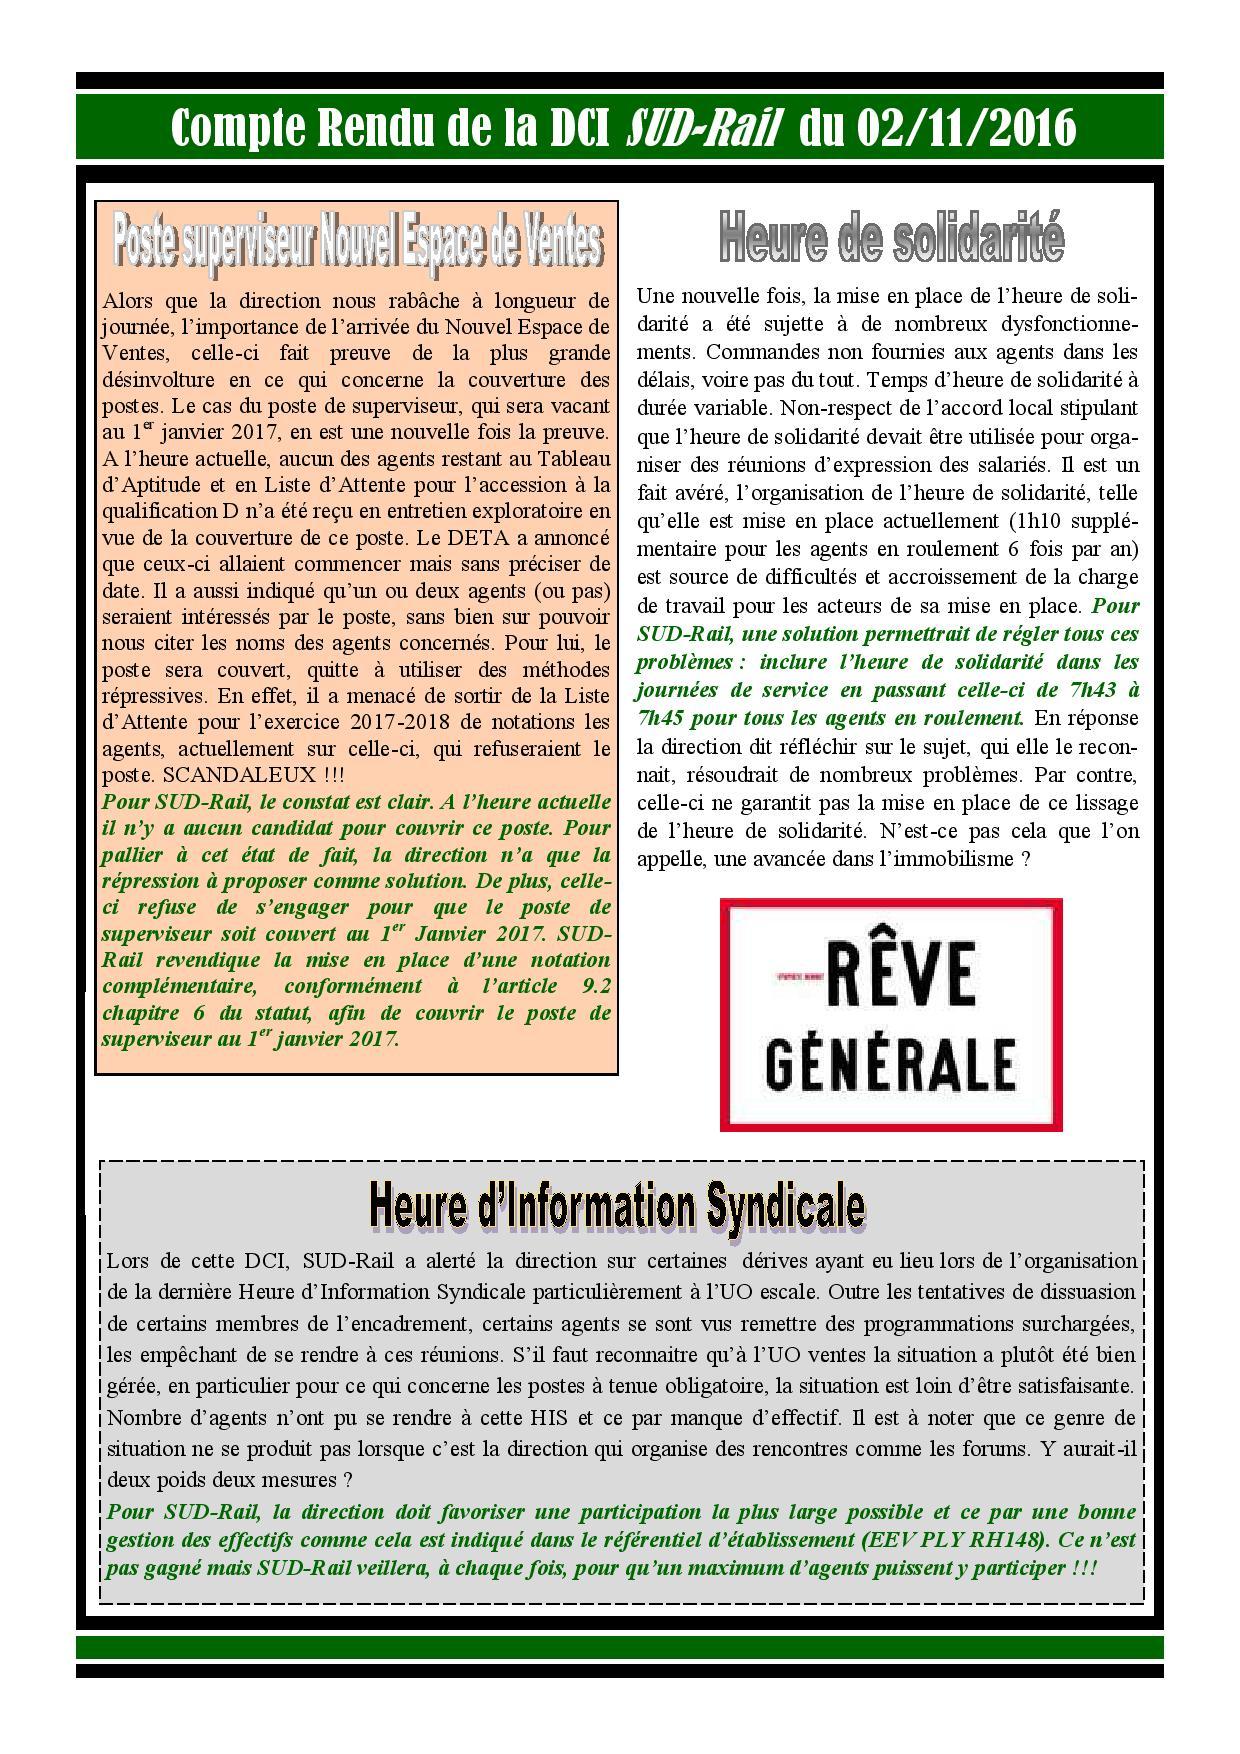 eev-cr-dci-02-11-2016-page-002